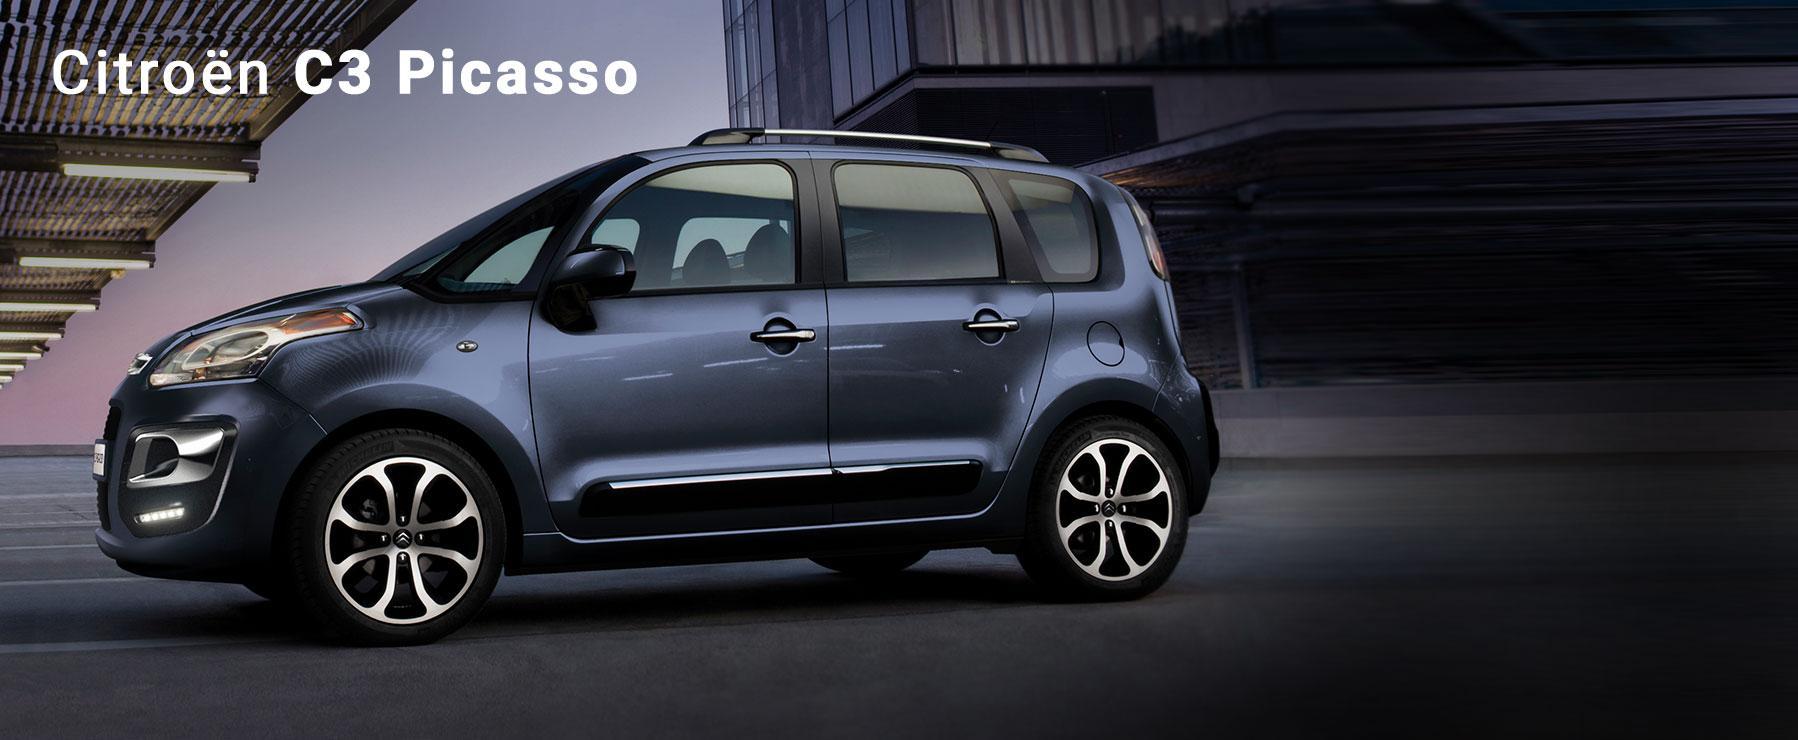 C3 Picasso SUV